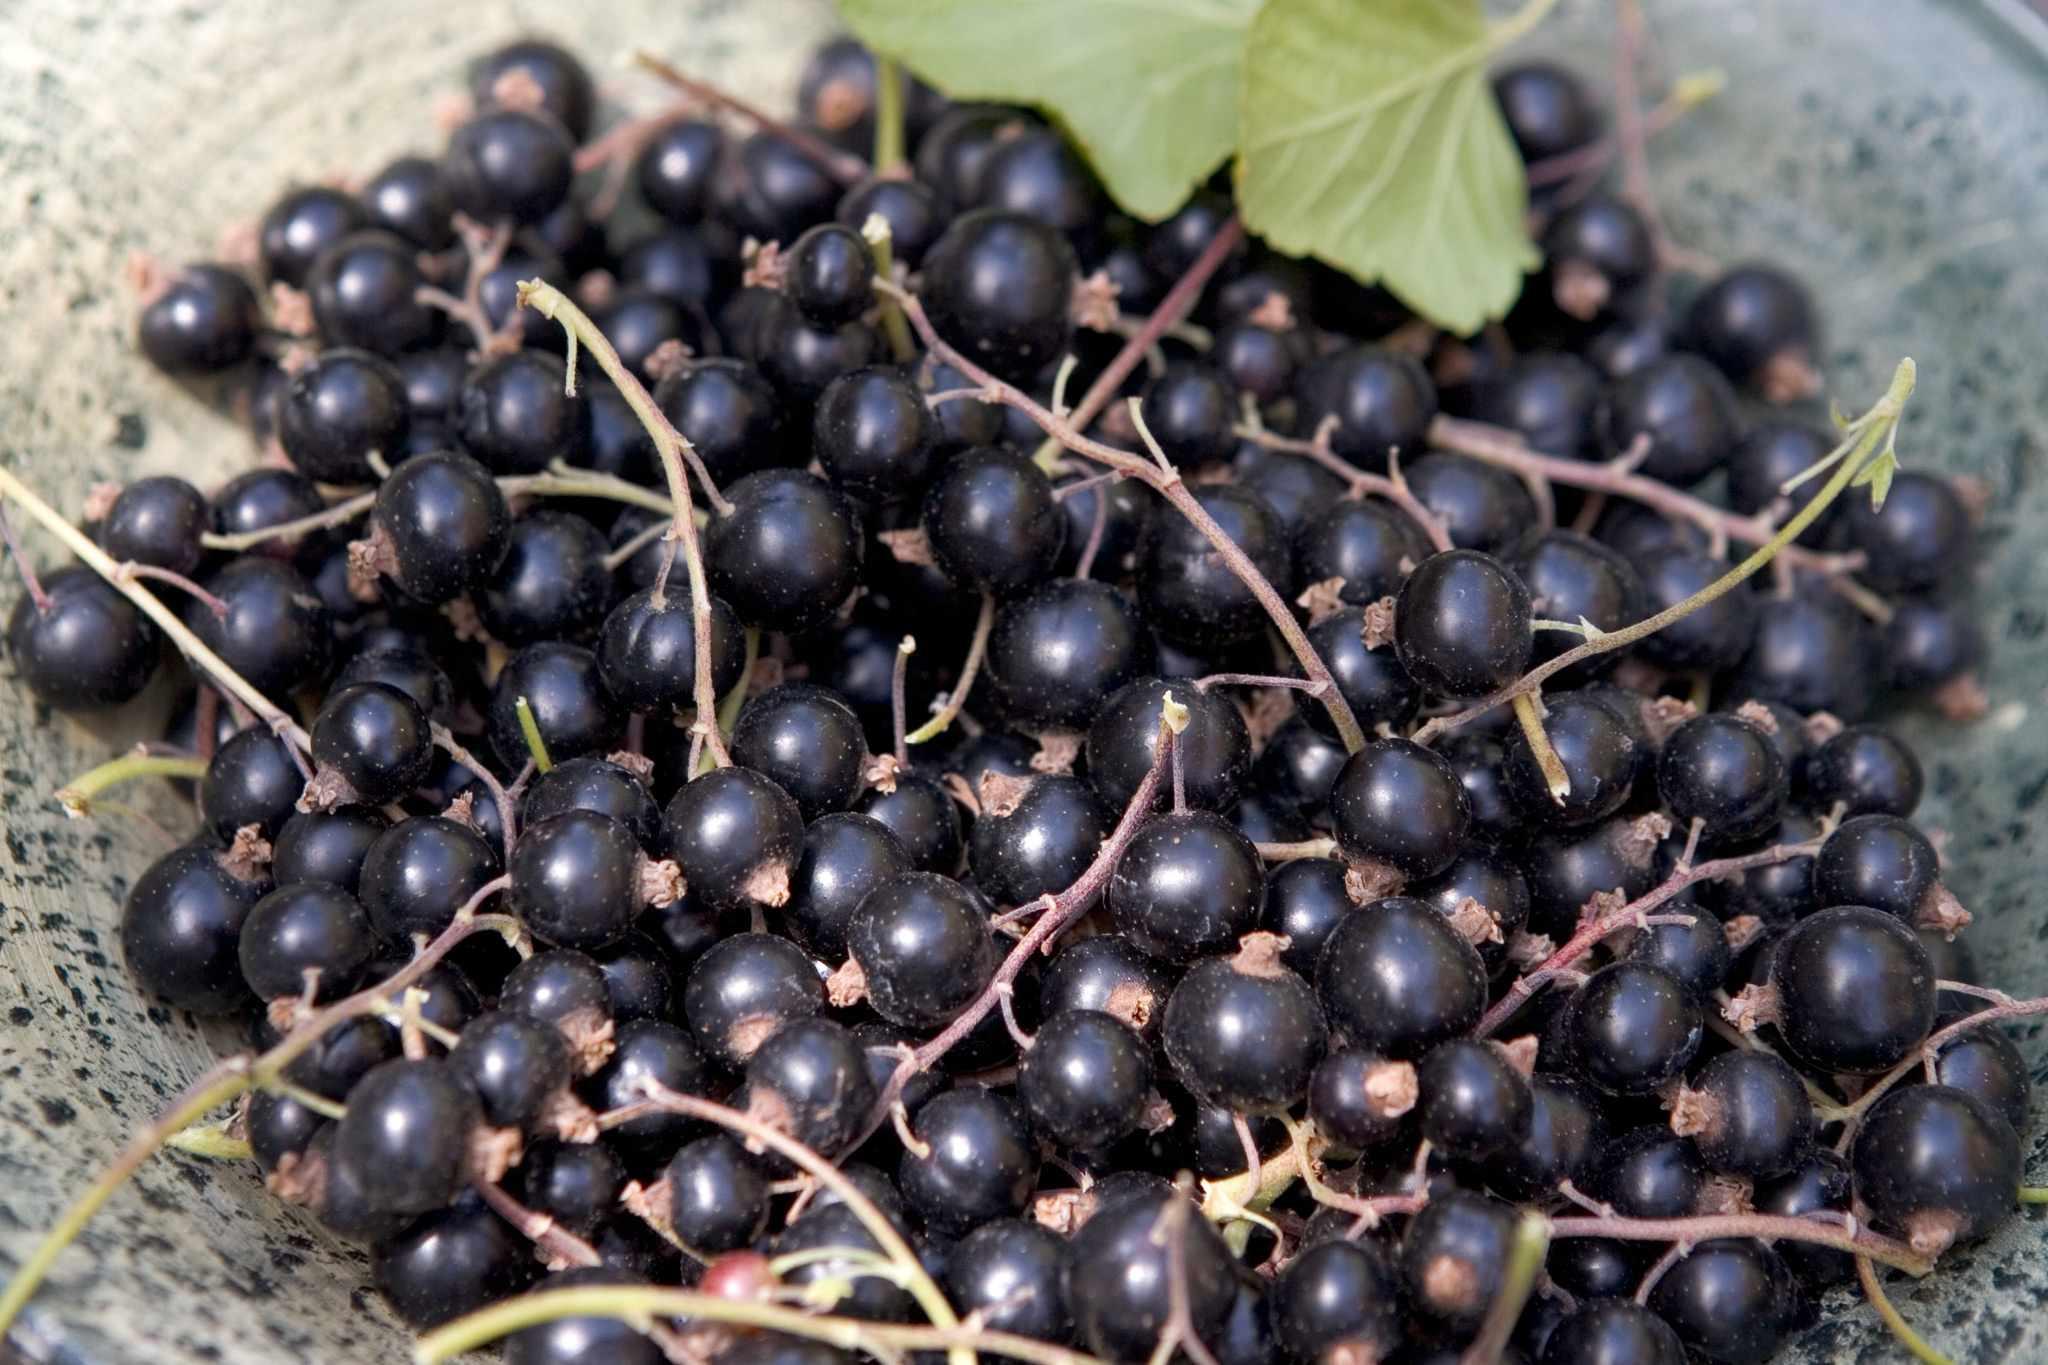 How to grow blackcurrants